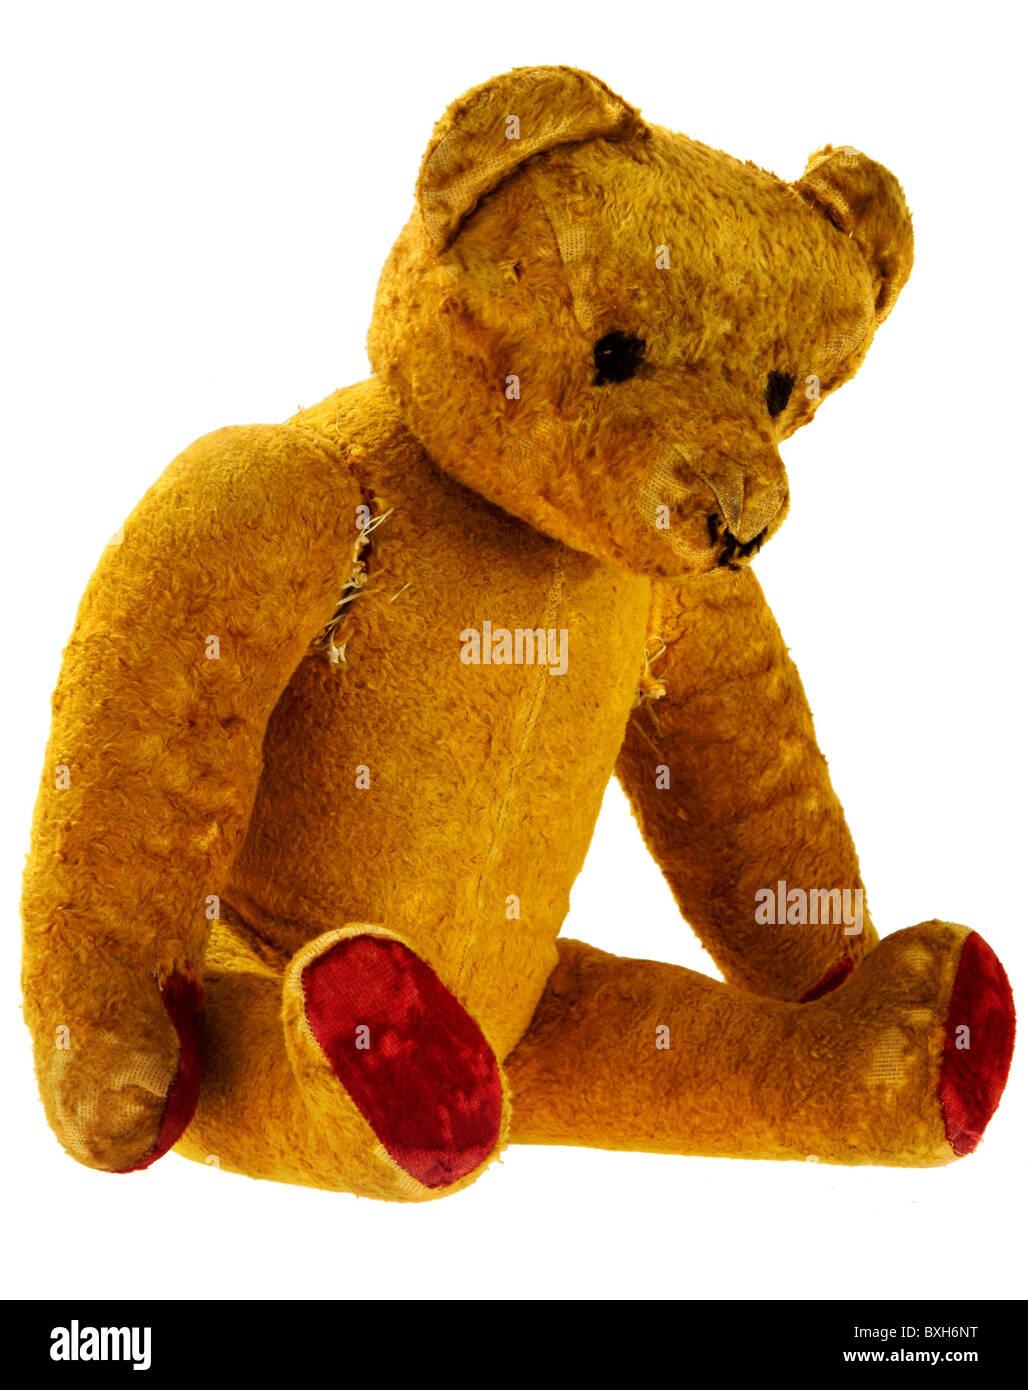 20th Century Toys : Toys cuddly toy teddy bear germany circa  s